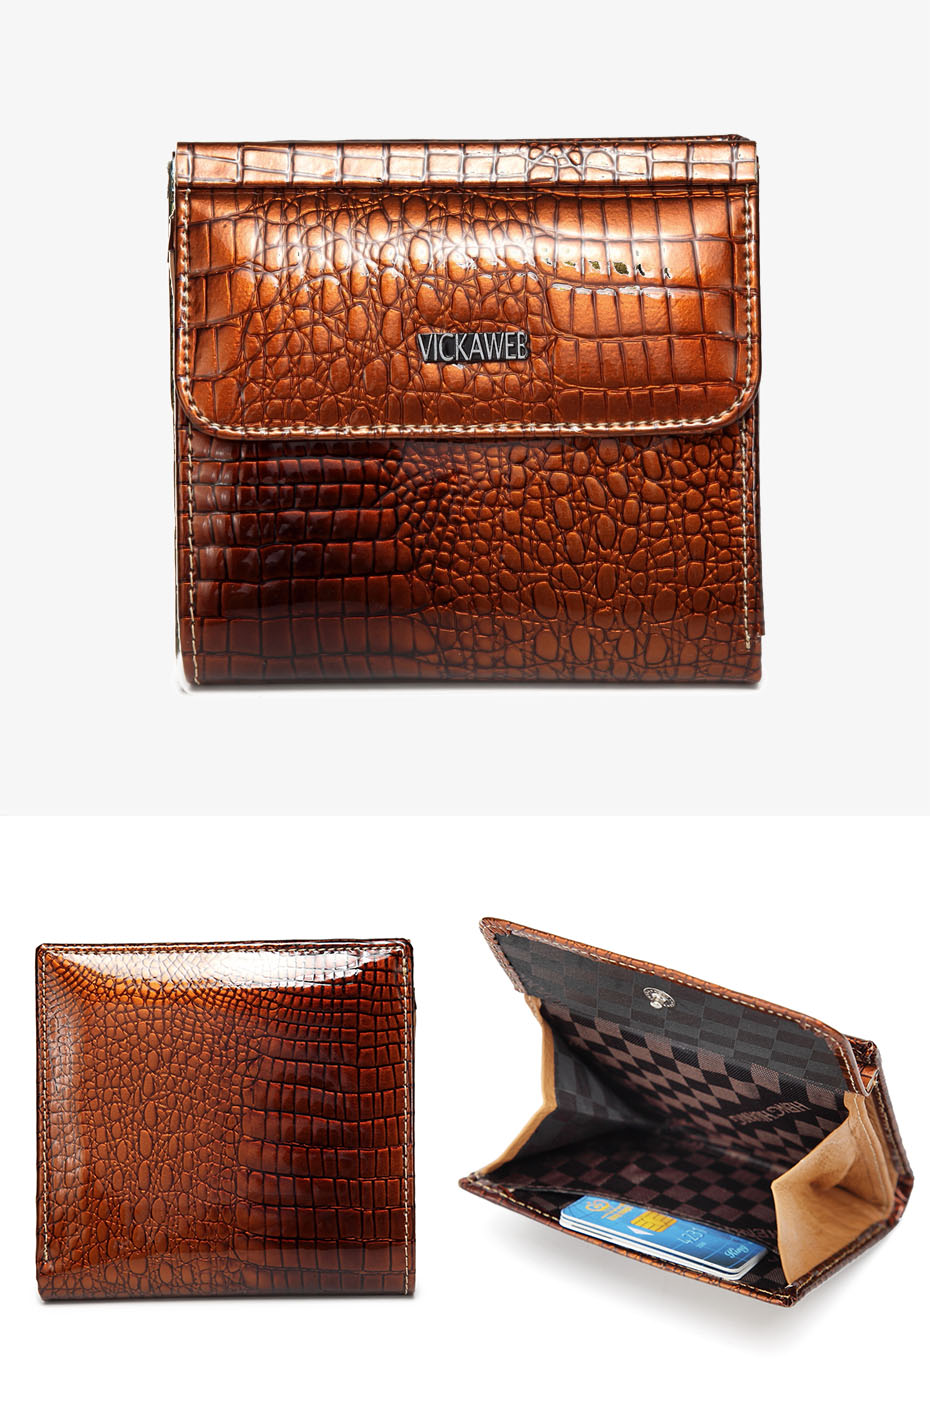 VICKAWEB Mini Wallet Women Genuine Leather Wallets Fashion Alligator Hasp Short Wallet Female Small Woman Wallets And Purses-AE209-019